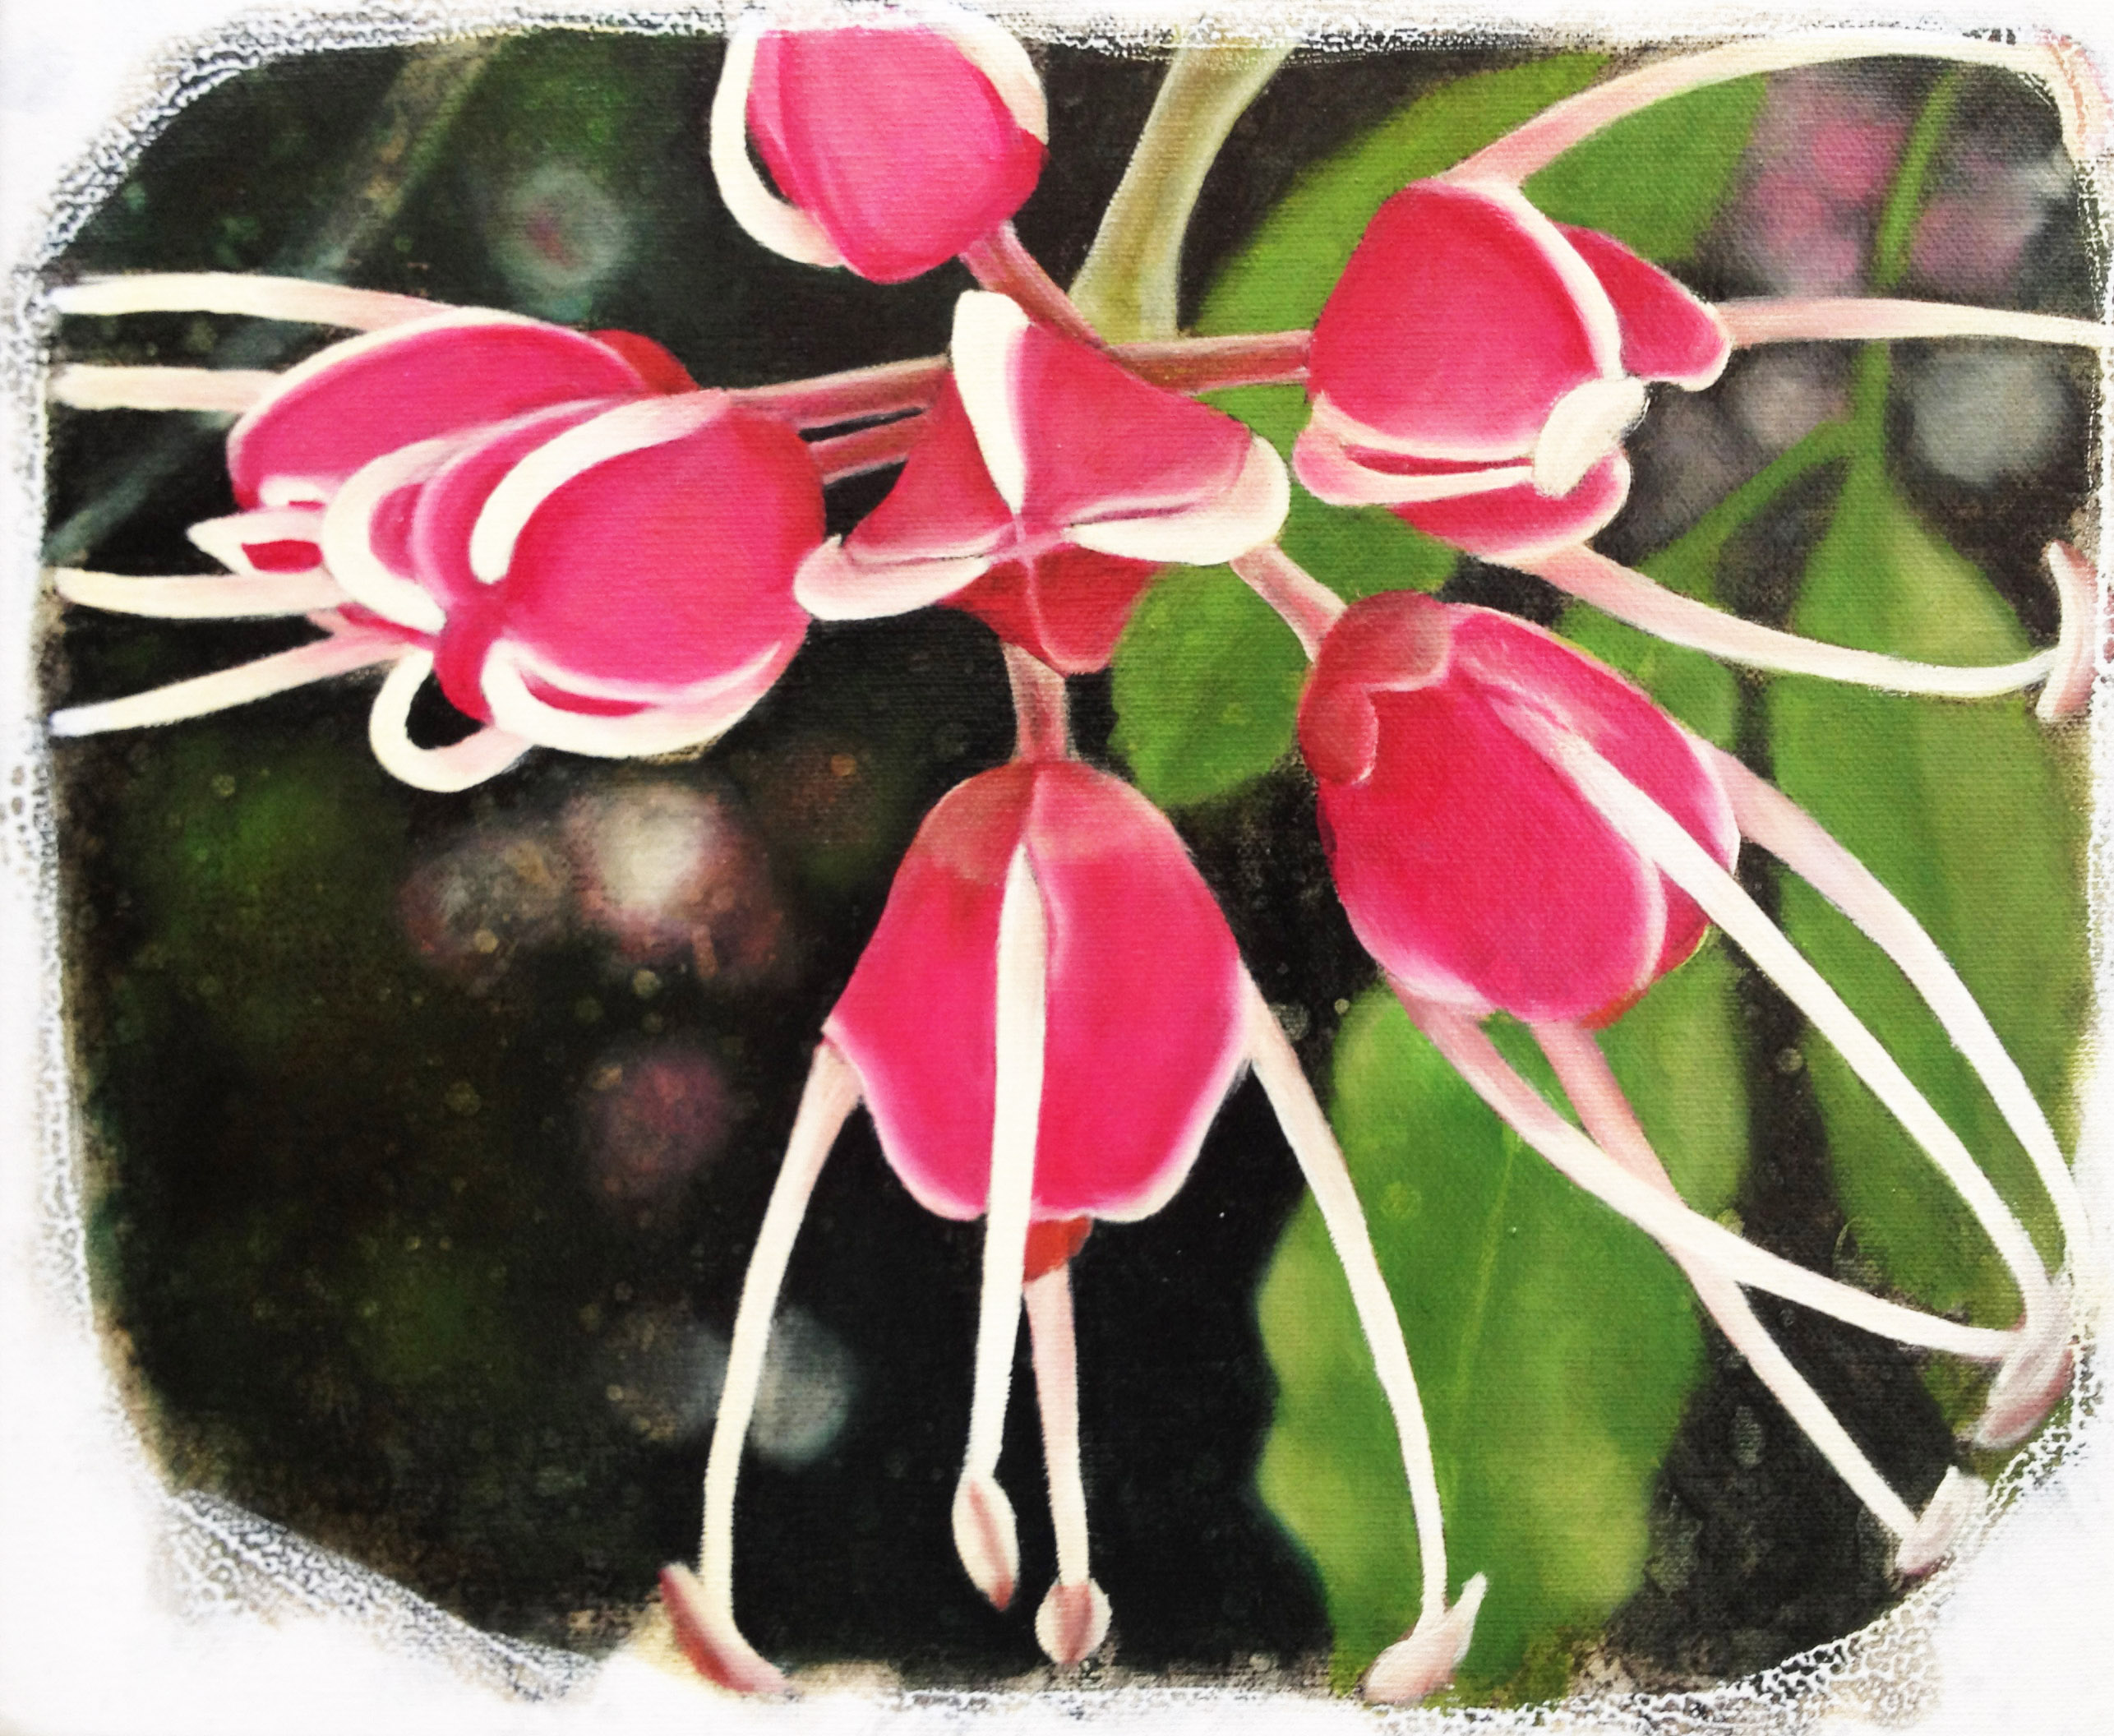 Gondwana's garden #9